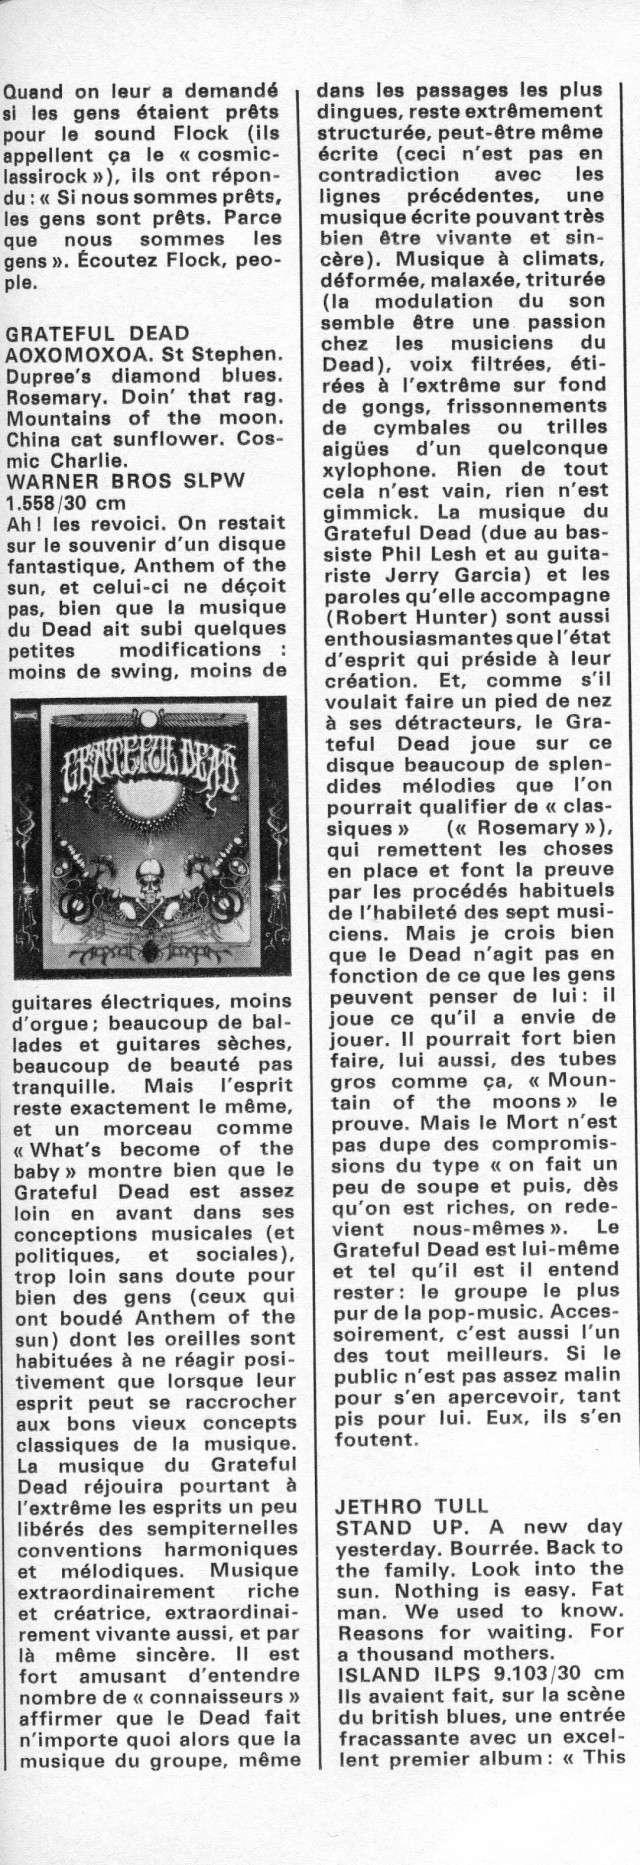 Grateful Dead - AoxomoxoA (1969) R33-9810